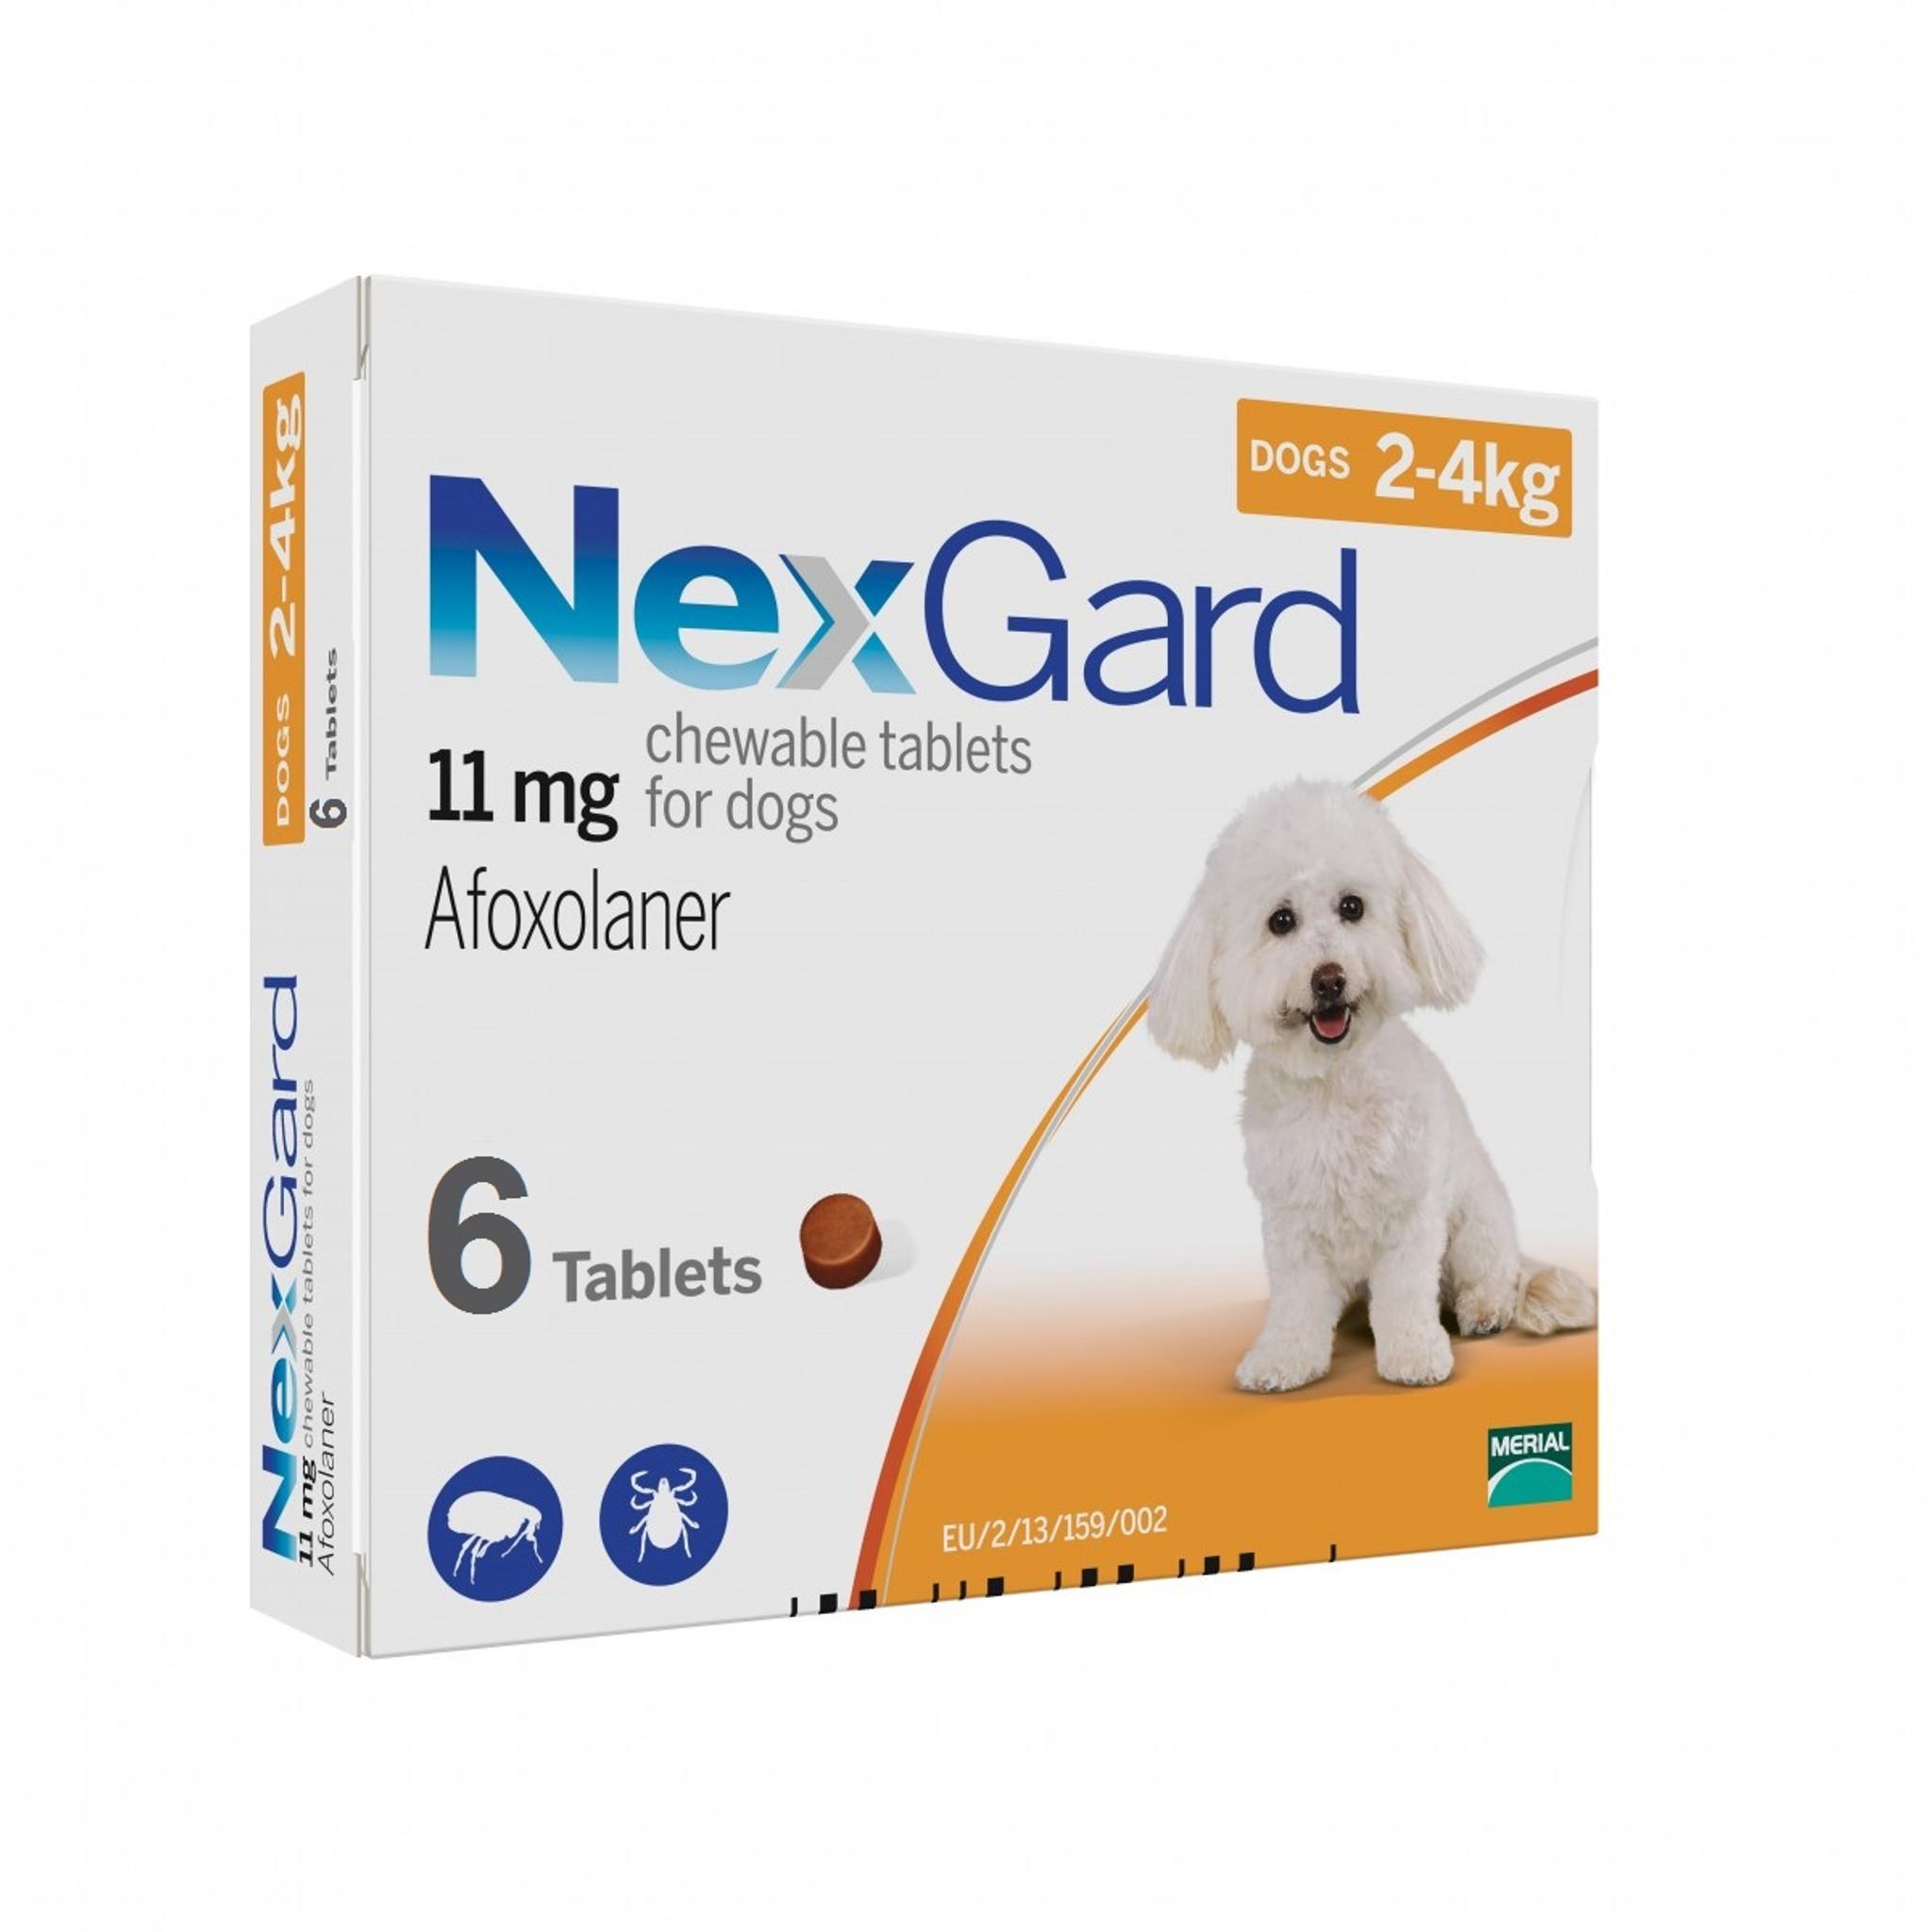 Nexgard For Dogs 2 4kg Orange 6 Pack Atlantic Pet Products